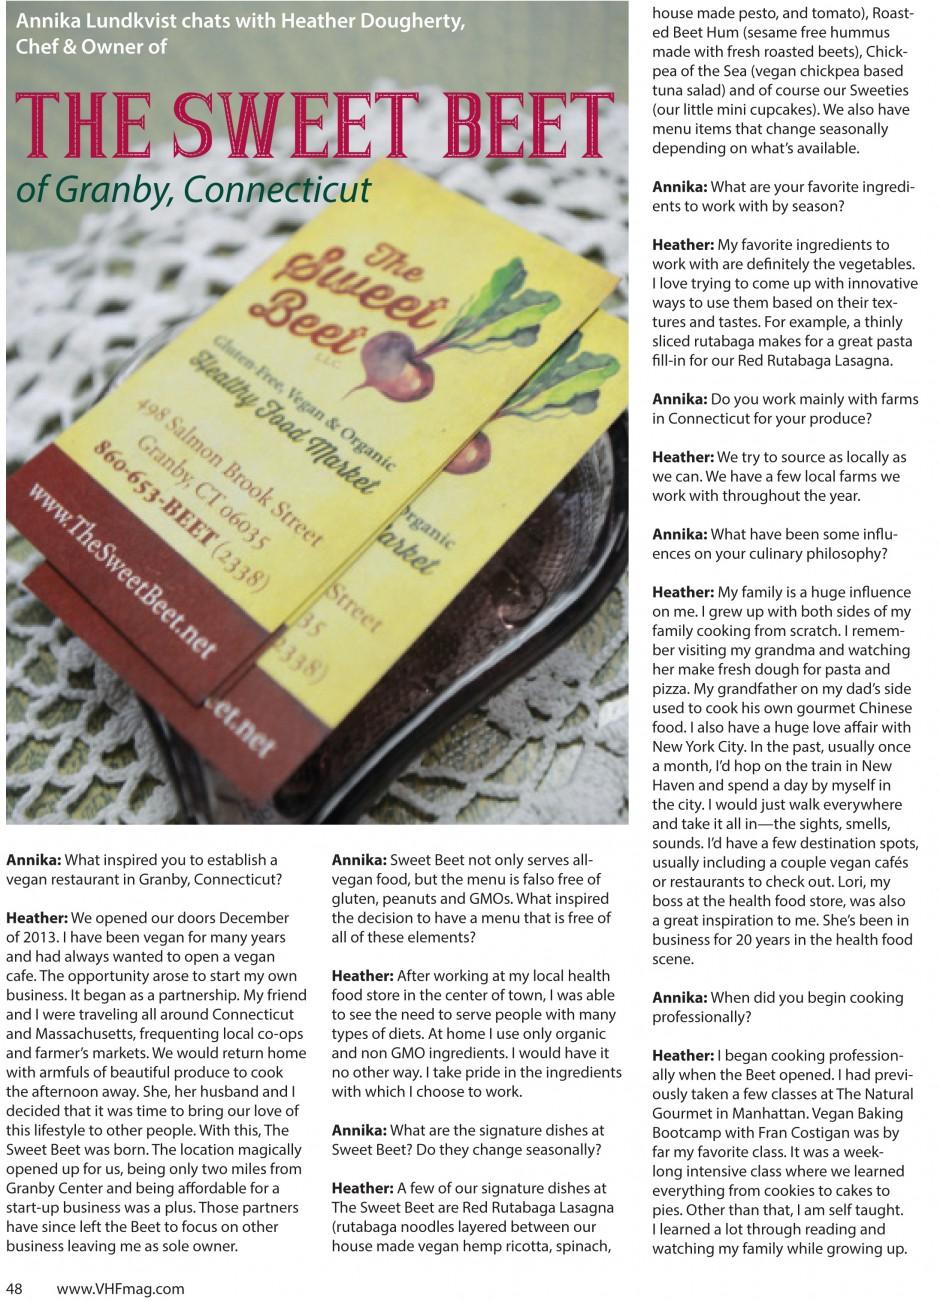 Sweet Beet article MA16-1